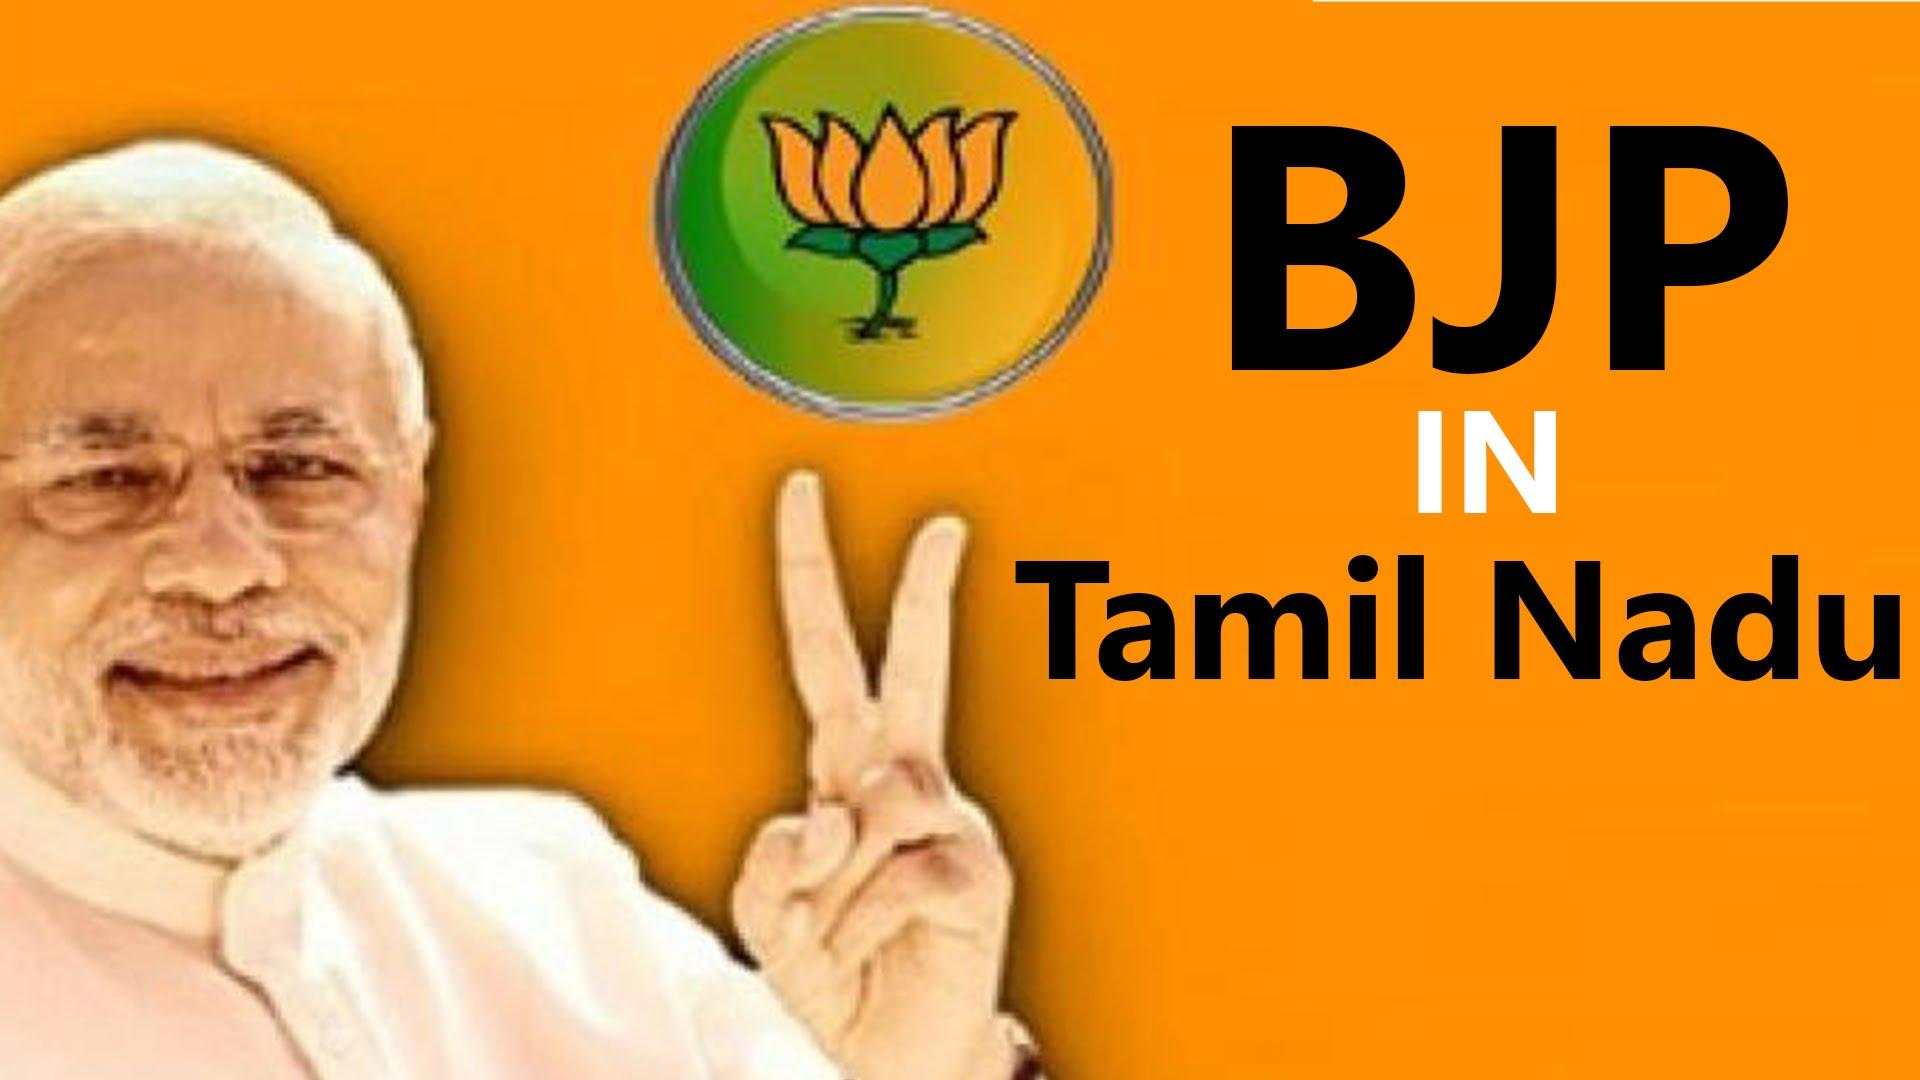 bjp in tamilnadu க்கான பட முடிவு